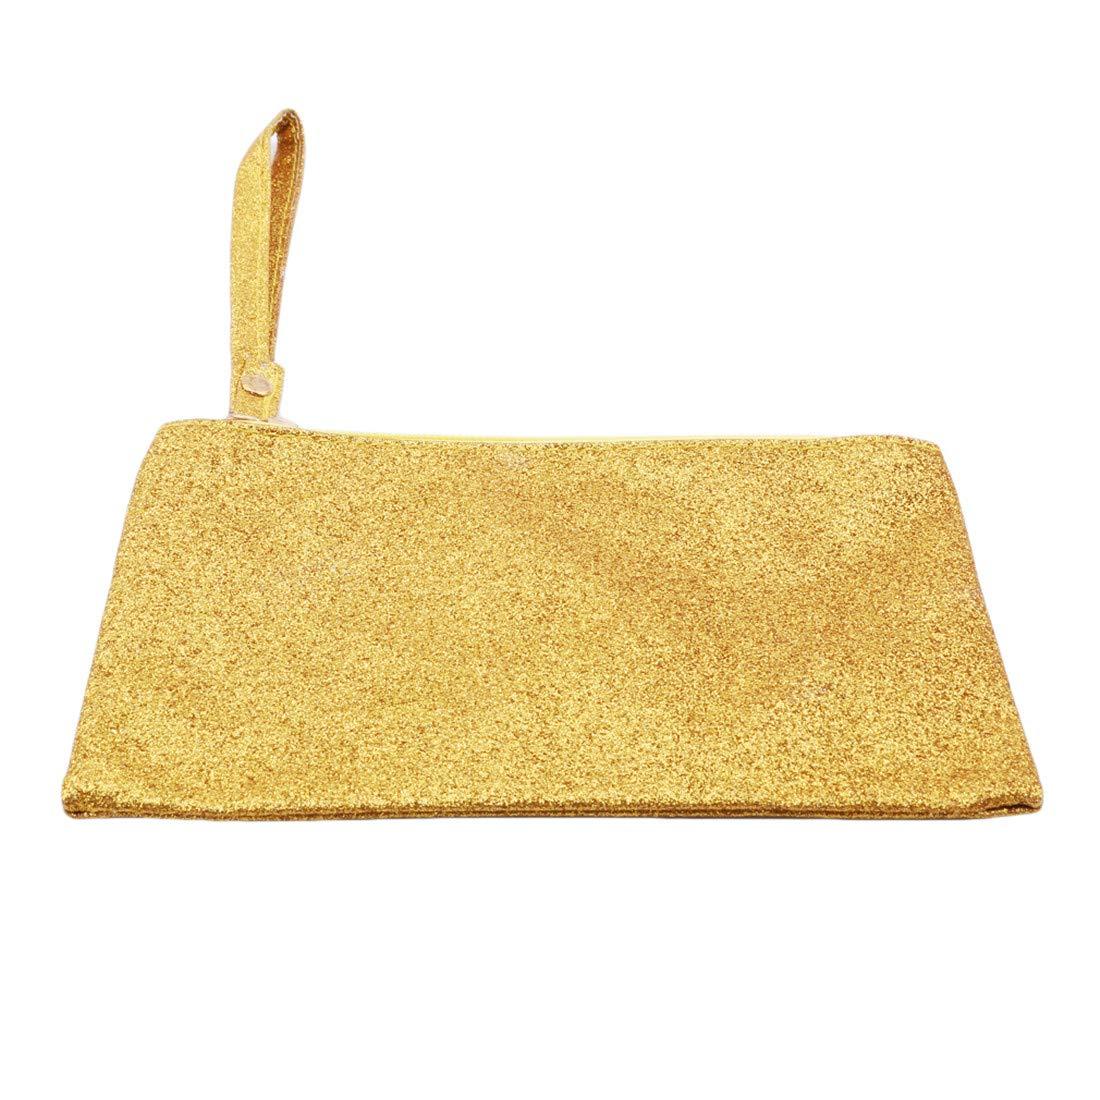 VWH Men Women Wallets PU Bag Zipper Small Mini Clutch Phone Wristlet Party Handbag(Gold)